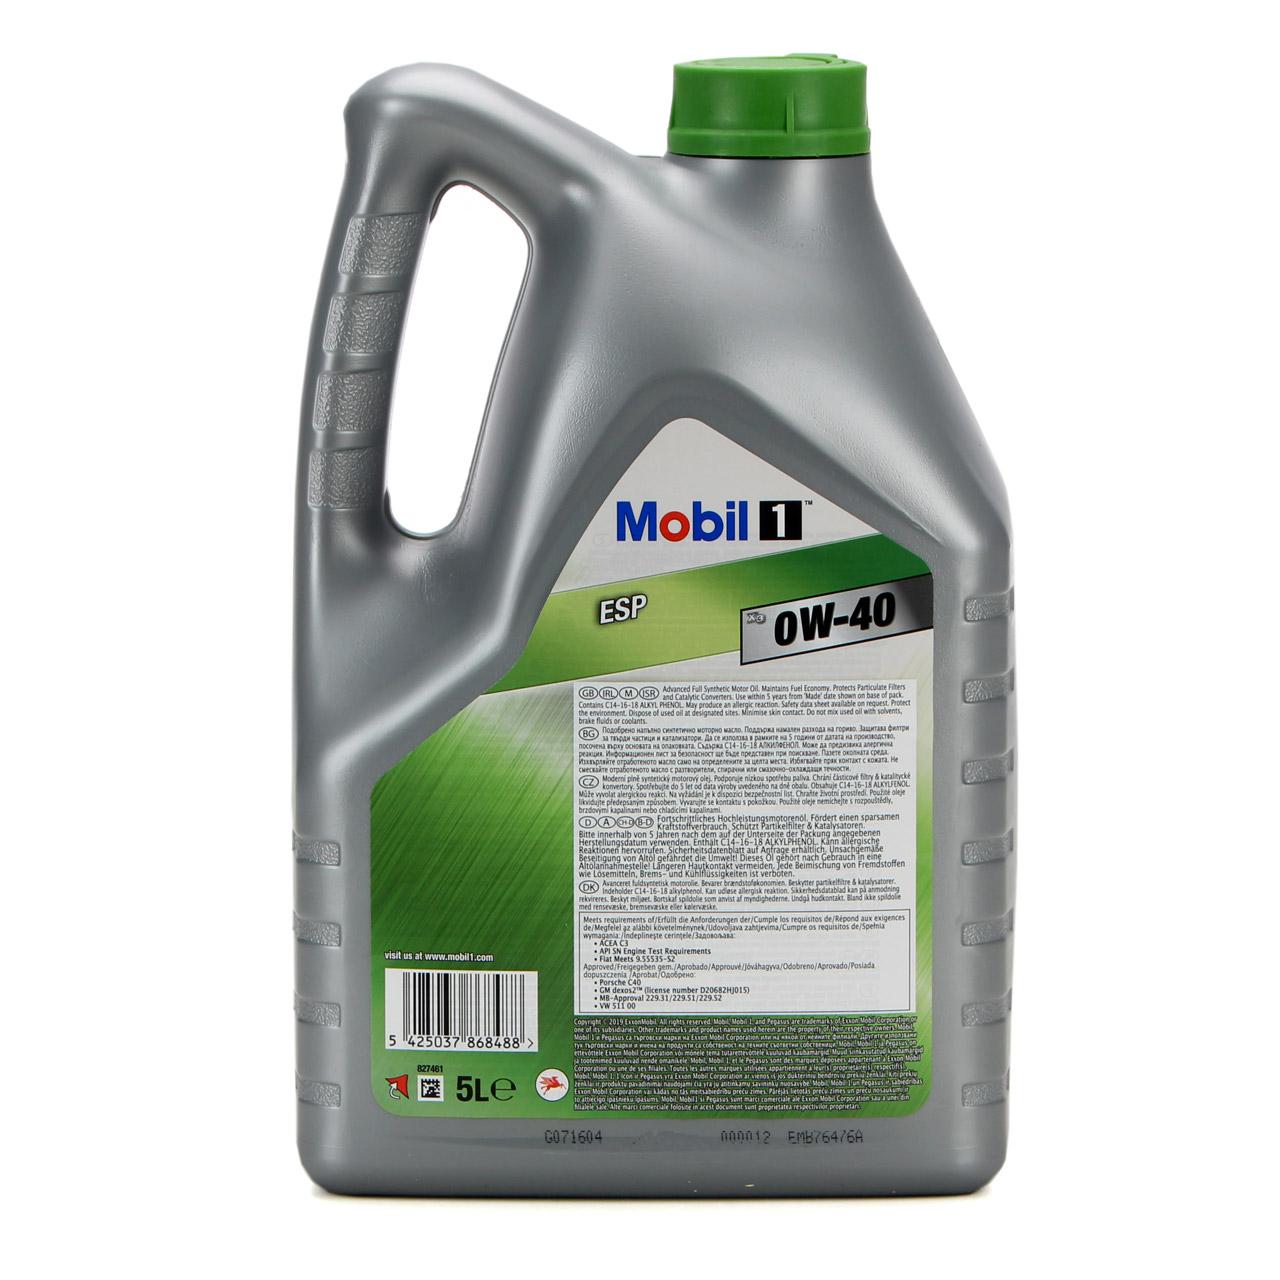 Mobil 1 ESP X3 C40 Motoröl Öl 0W-40 0W40 dexos2 PORSCHE C40 VW 511.00 - 5 Liter